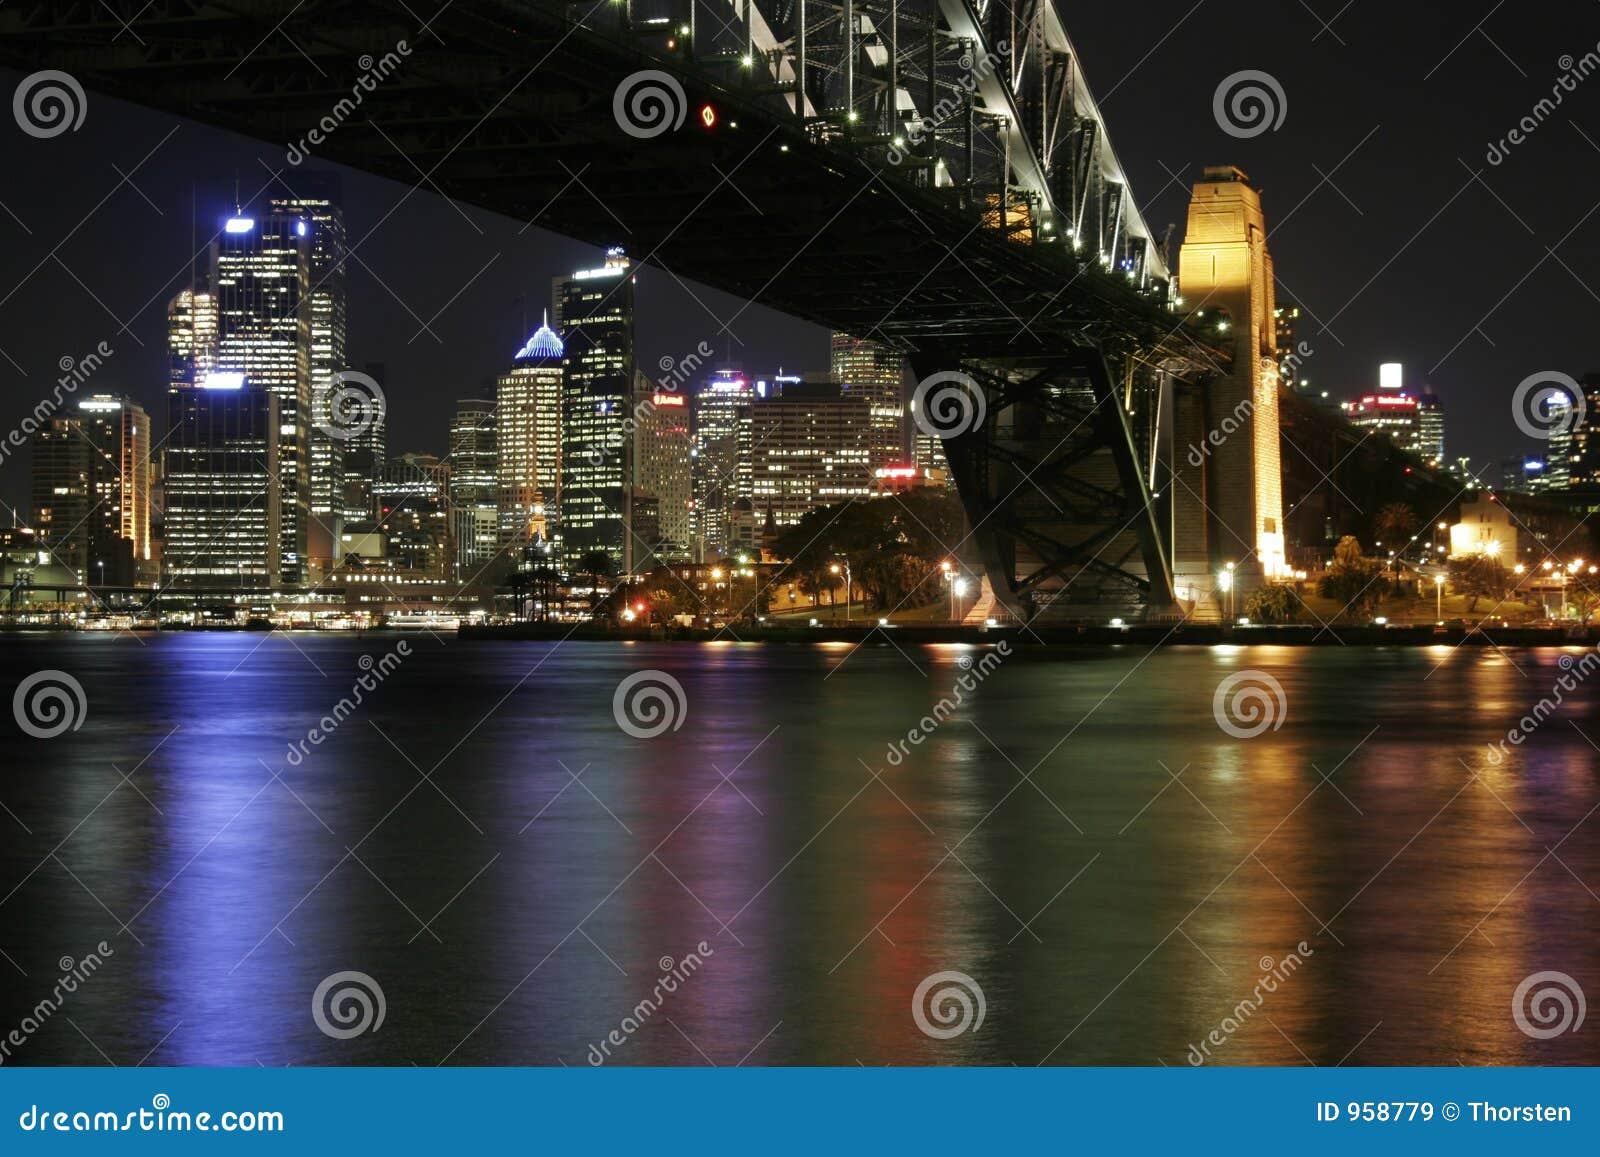 Date nights in Sydney